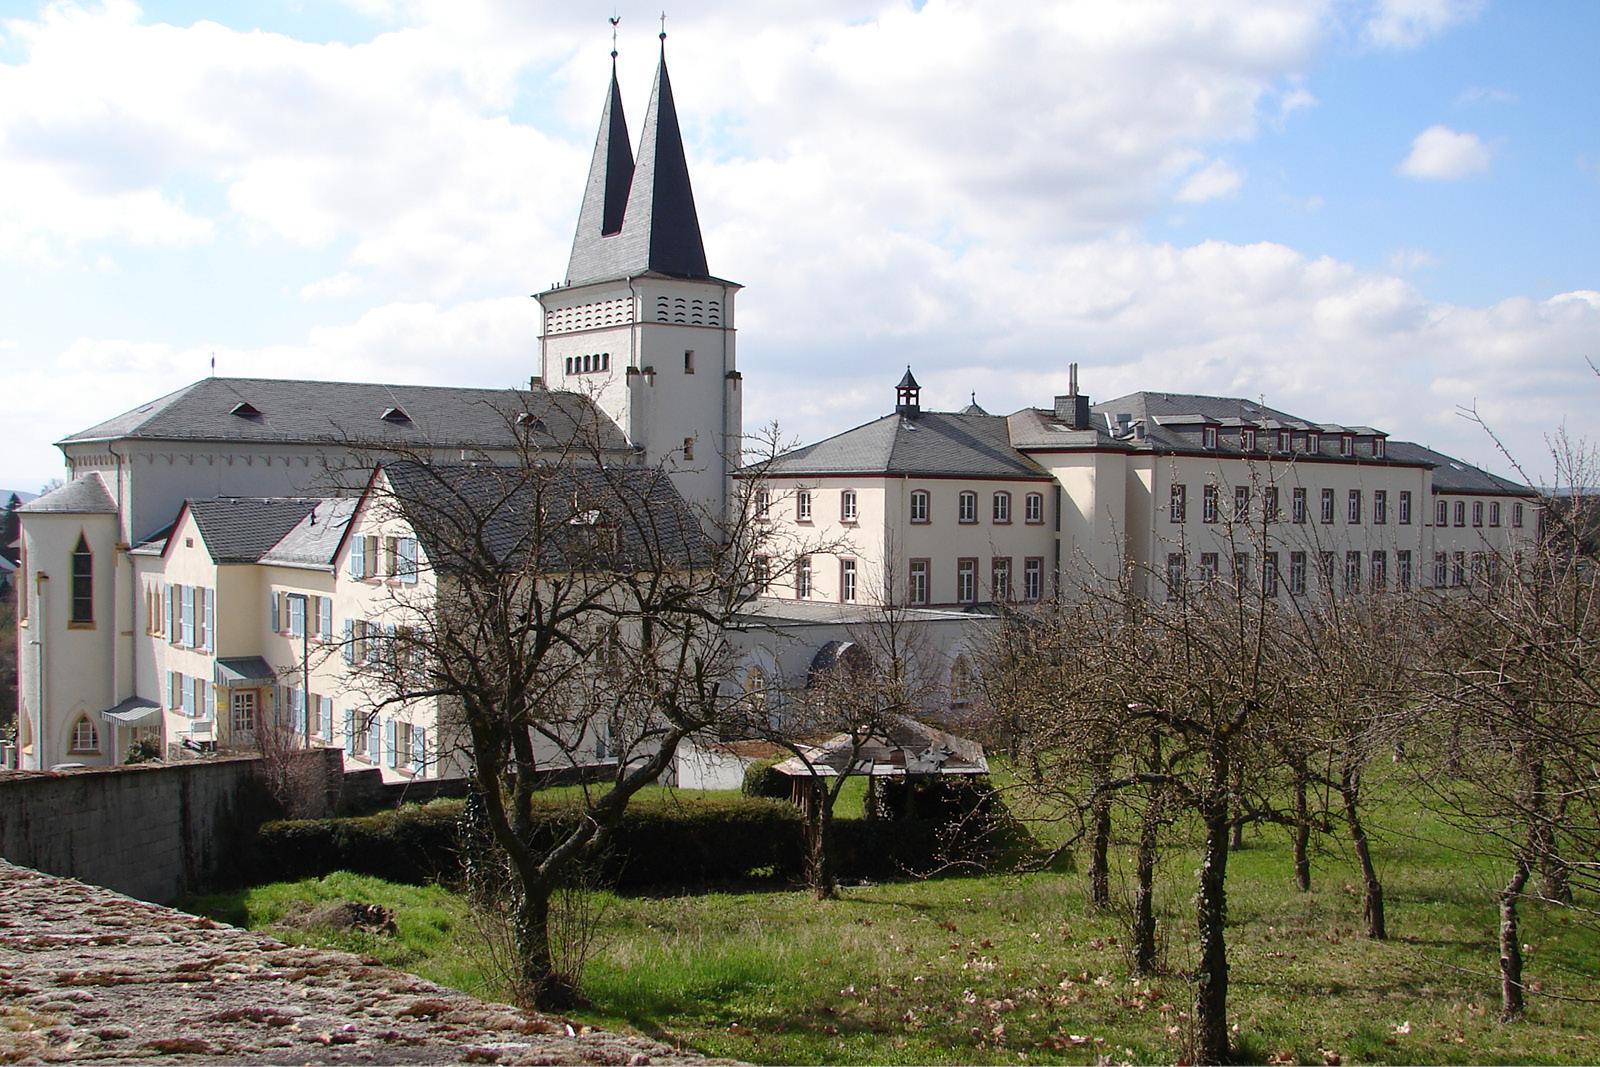 Kloster Johannisberg